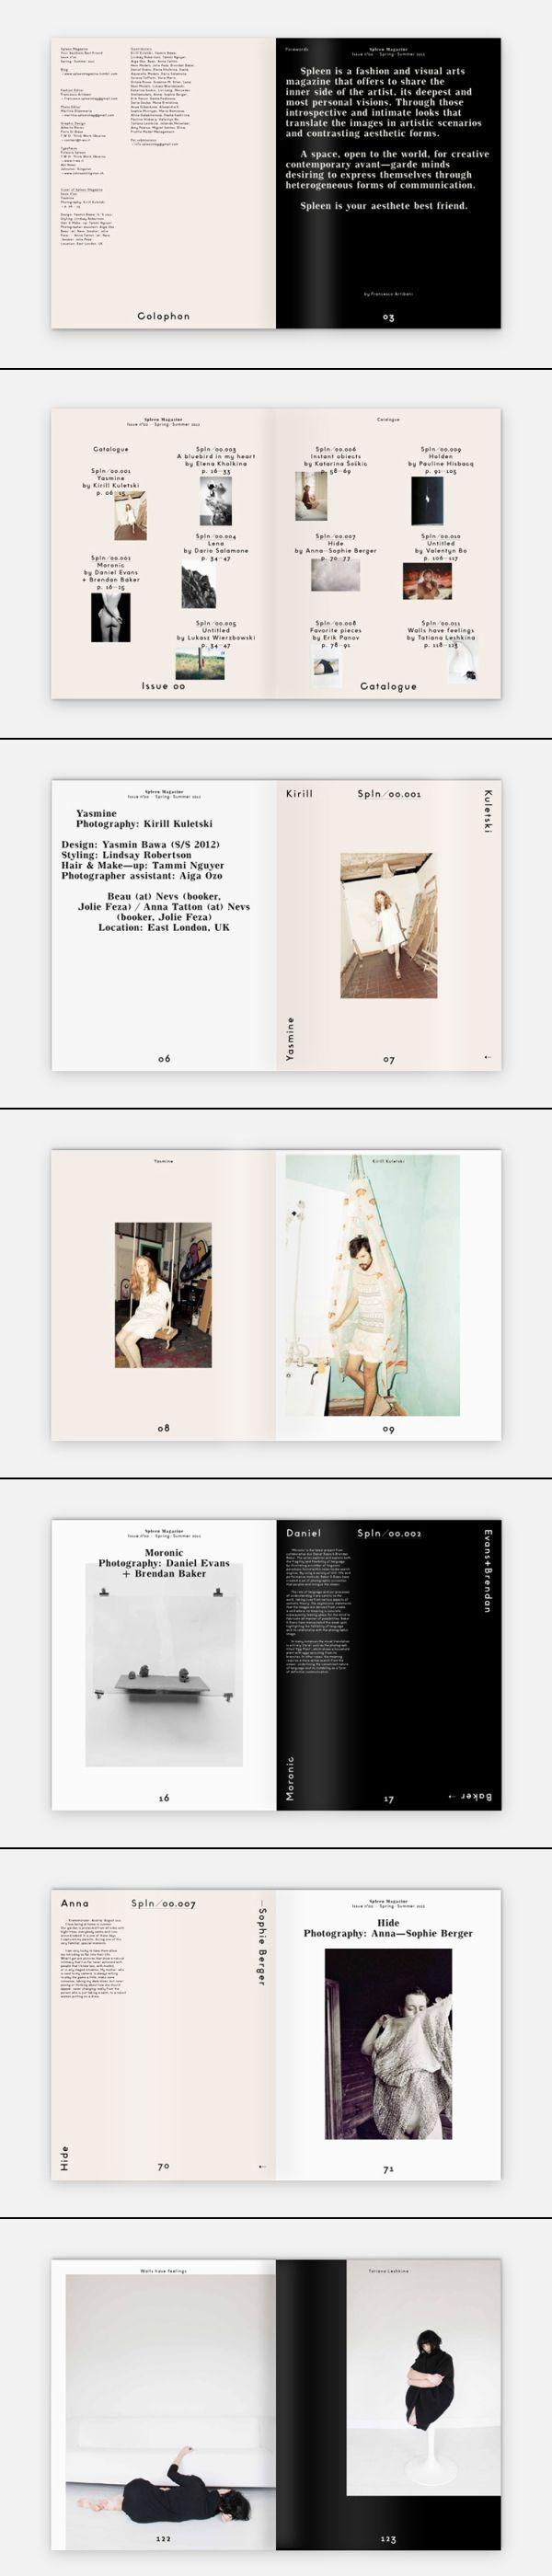 http://t-wo.it/2013/05/29/spleen-magazine-00/ #magazine #editorial #layout #spread